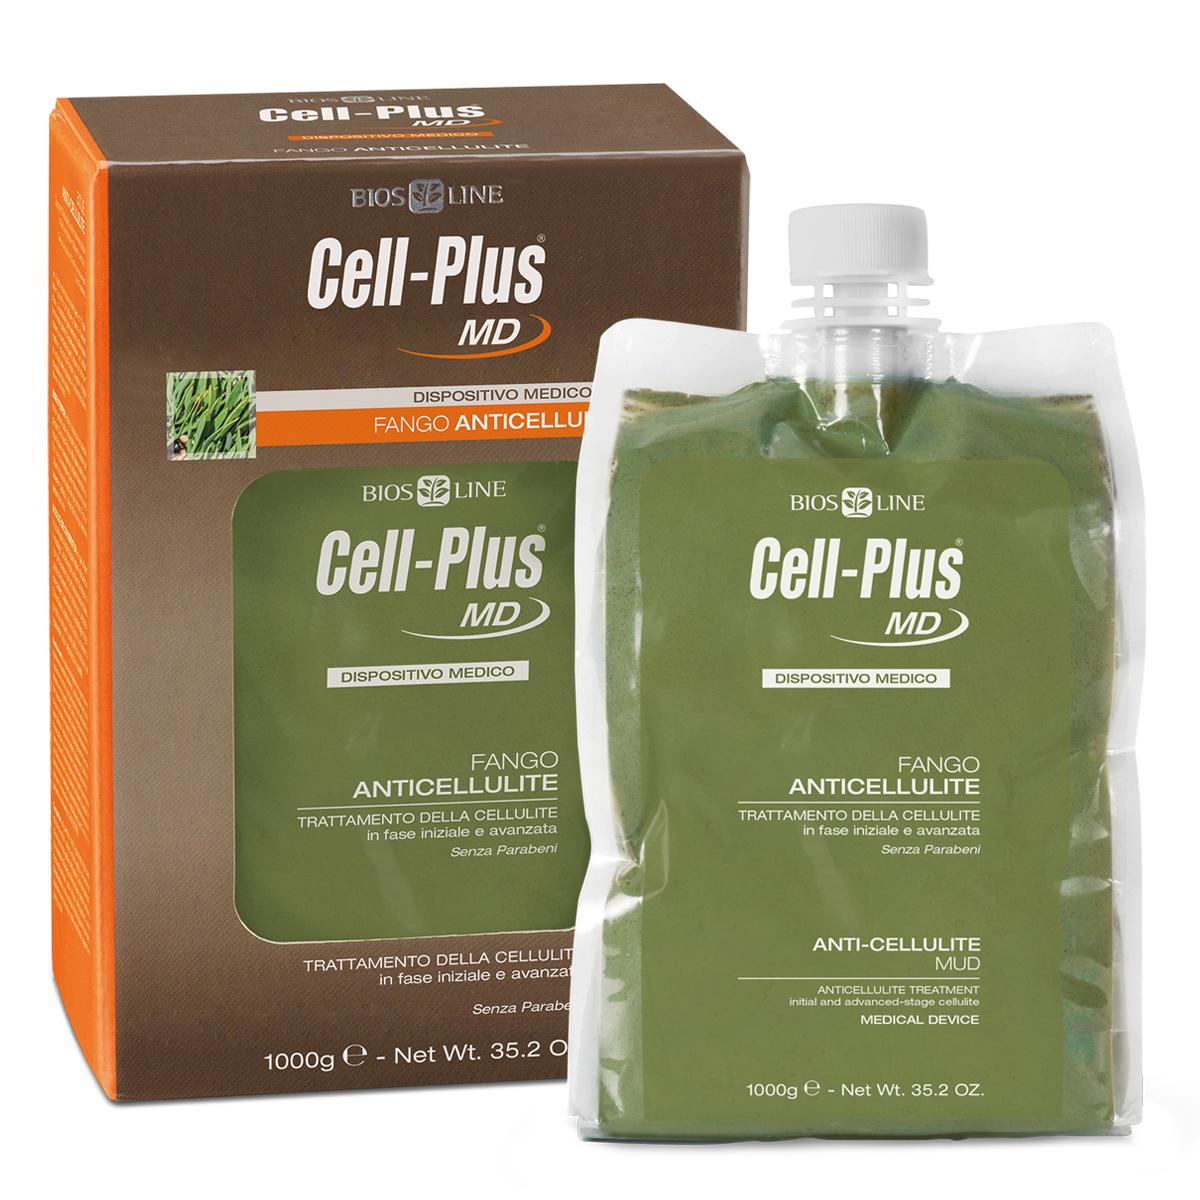 Cell-Plus MD Fango